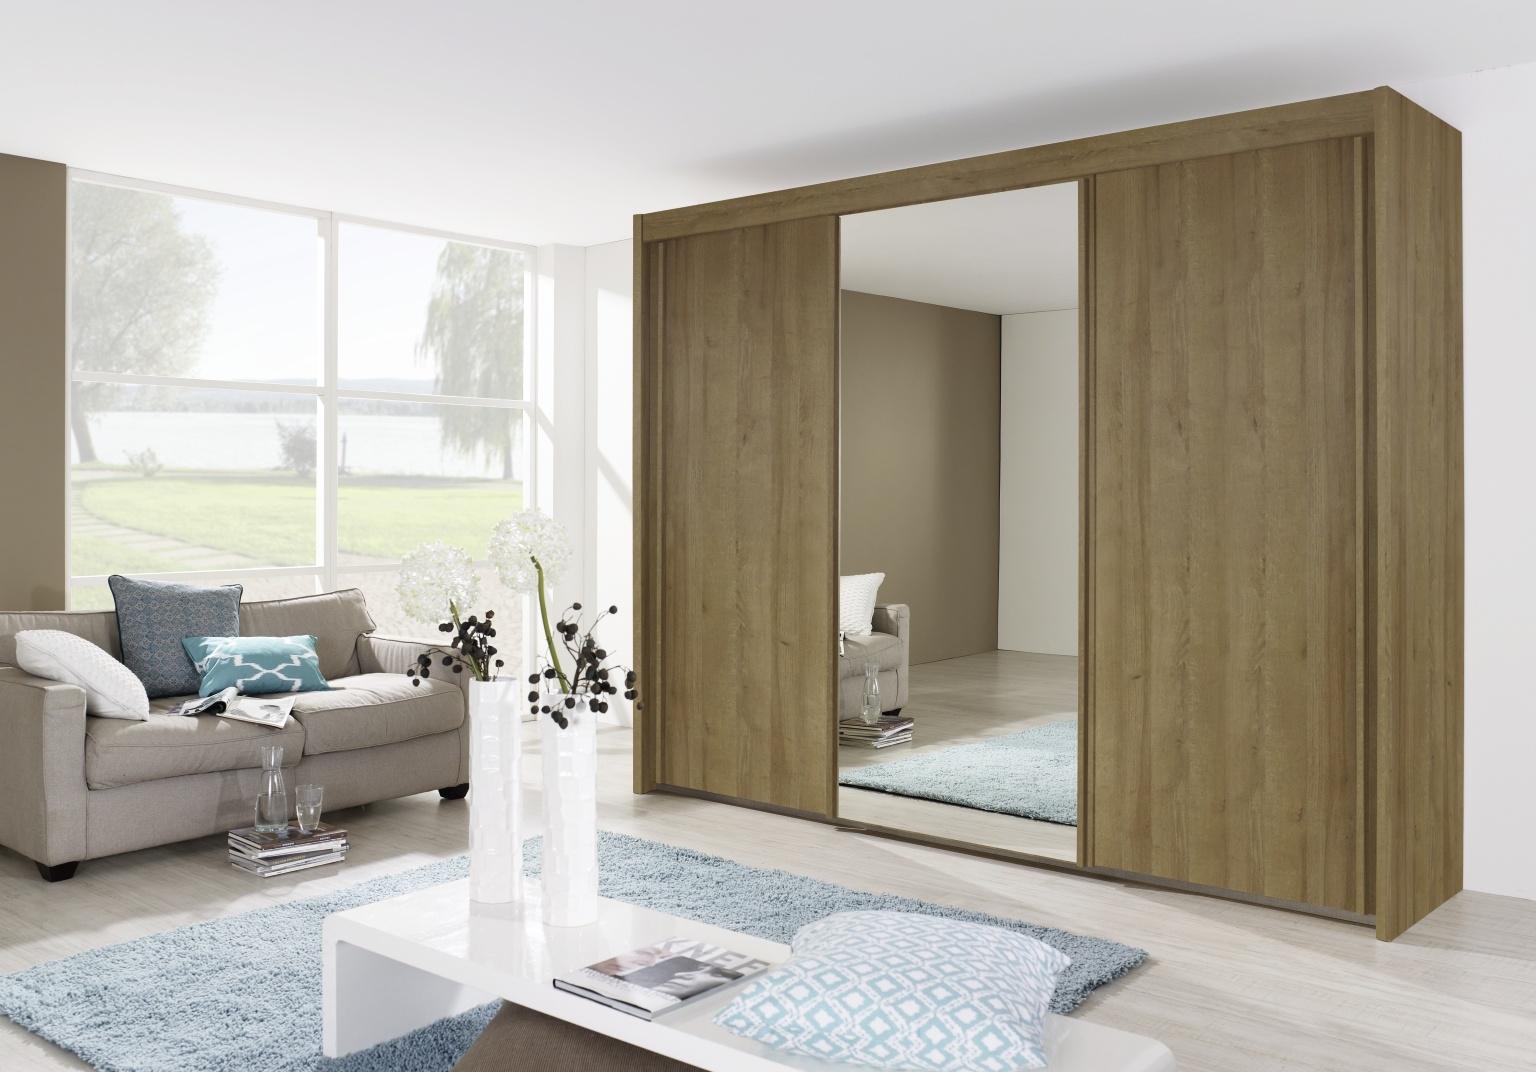 Rauch Imperial 4 Door 2 Mirror Sliding Wardrobe in Riviera Oak - W 320cm